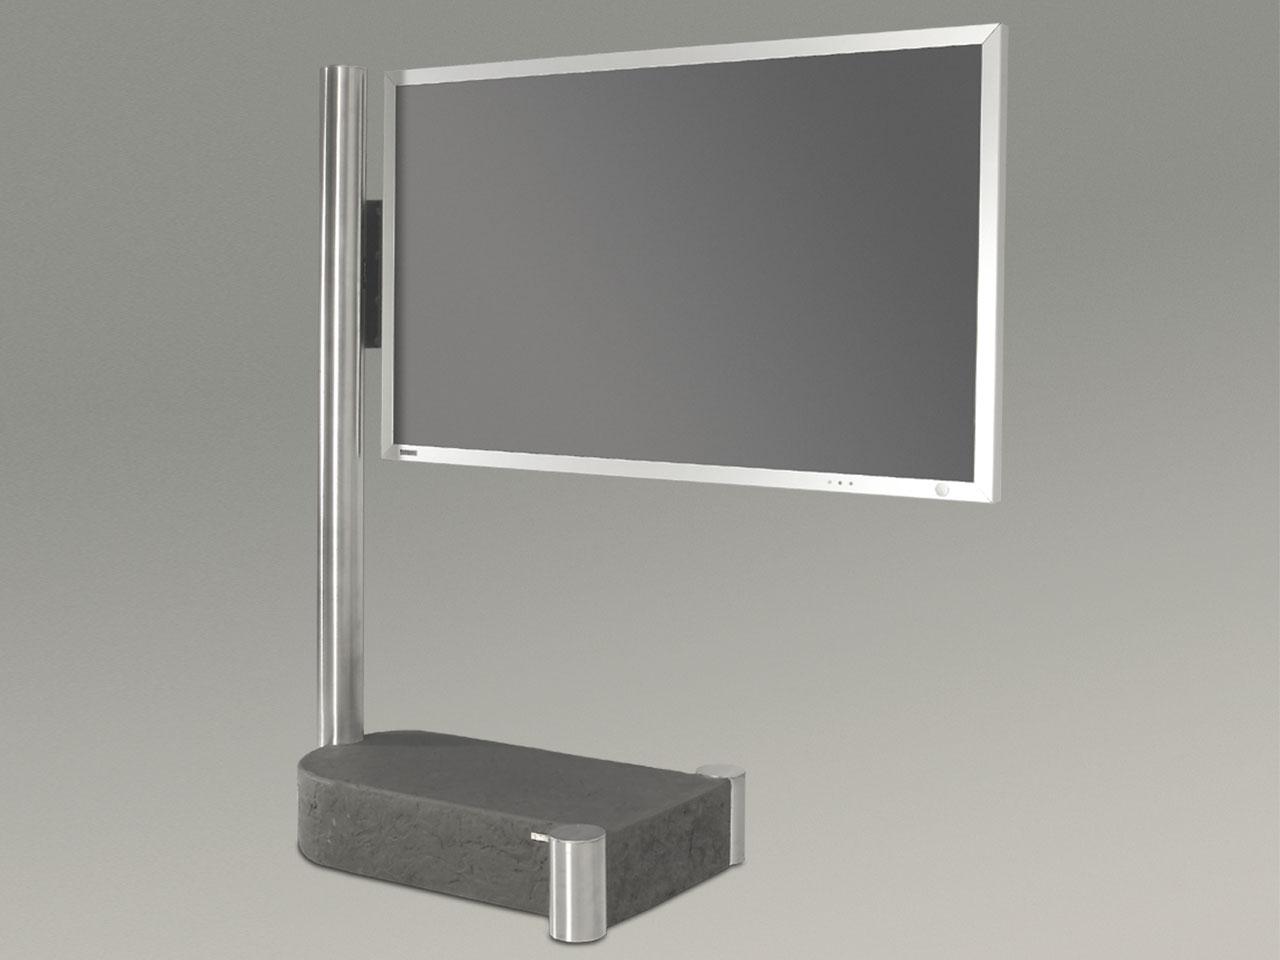 wissmann tv halter individual art110 g nstig kaufen cmb systeme. Black Bedroom Furniture Sets. Home Design Ideas